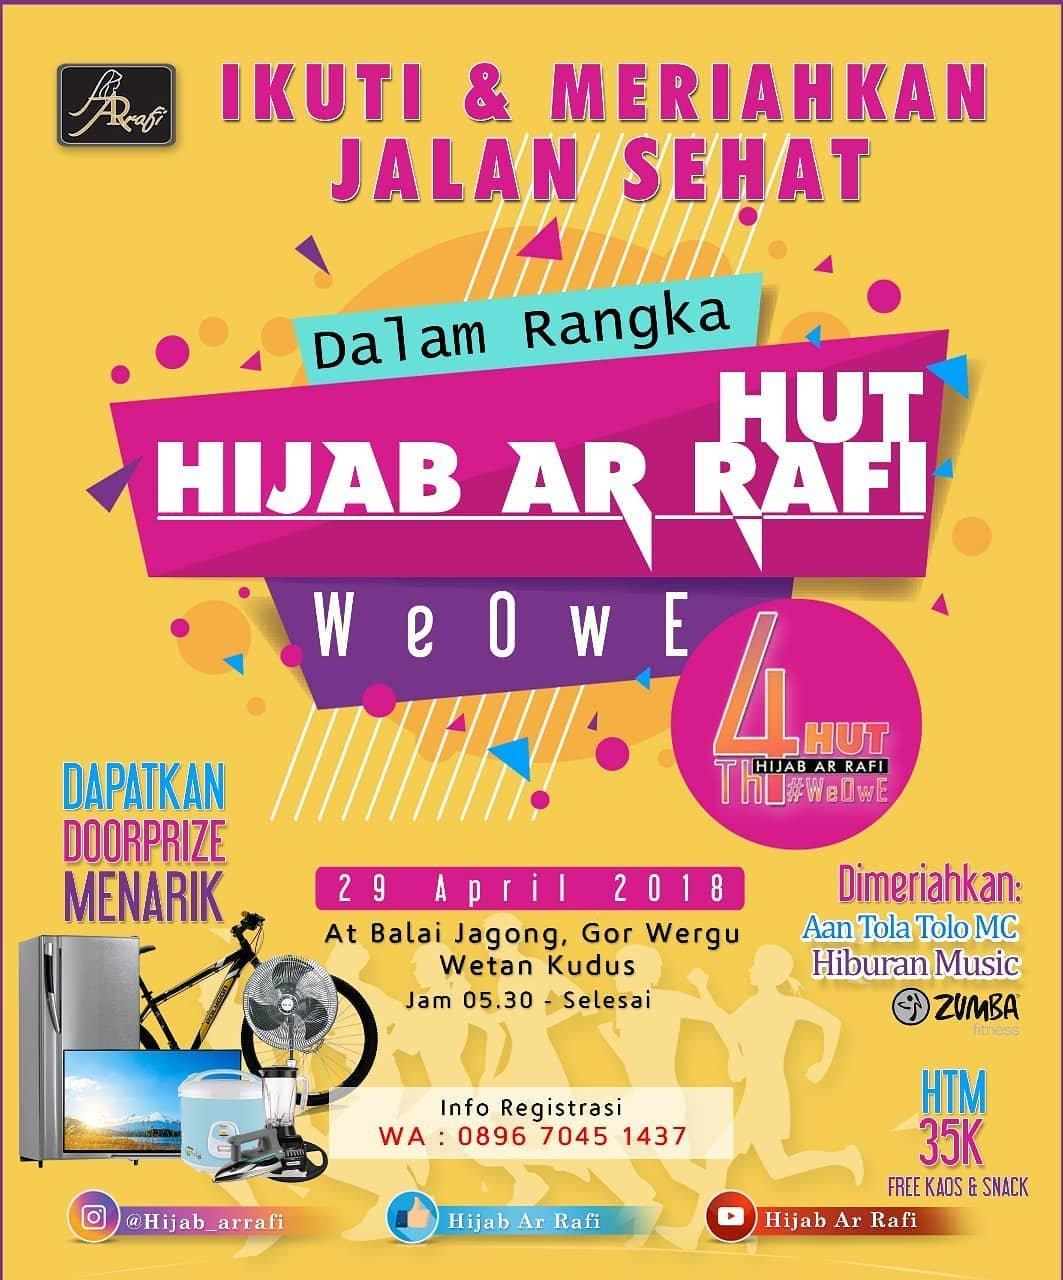 Event Kudus - Jalan Sehat  Hut Hijab Ar Rafi